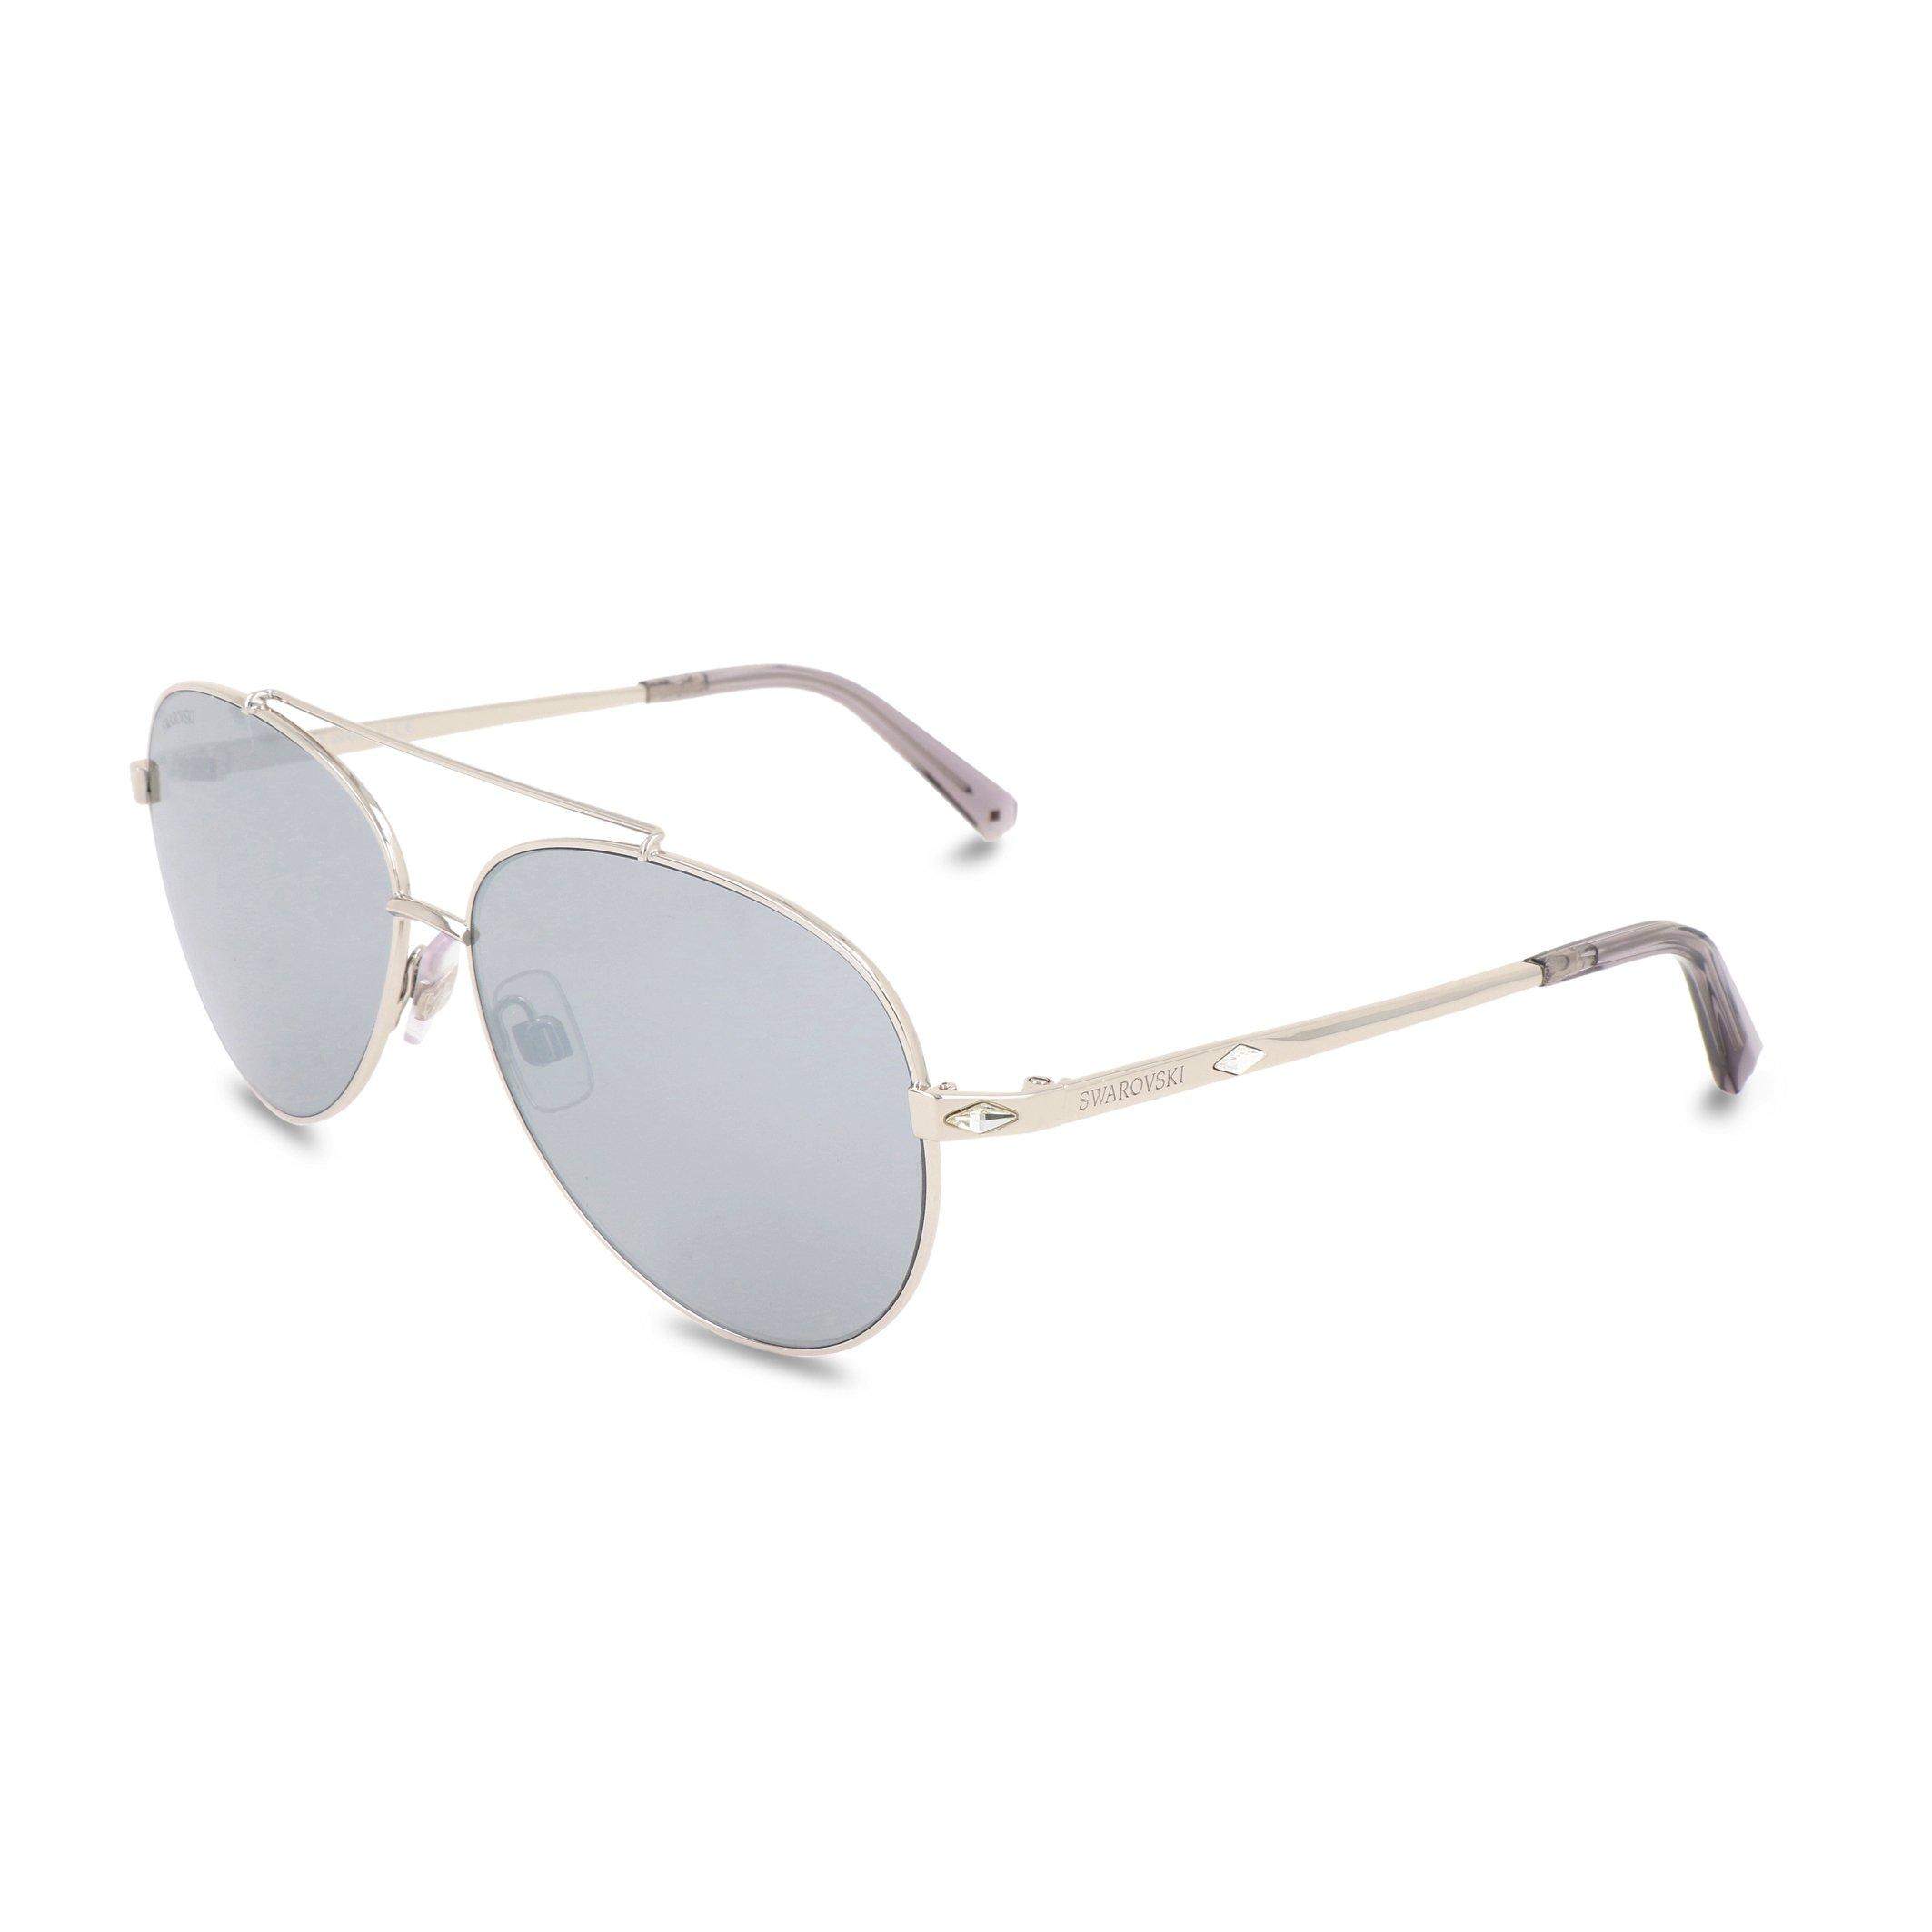 Swarovski Women's Sunglasses Various Colours SK0194 - grey NOSIZE